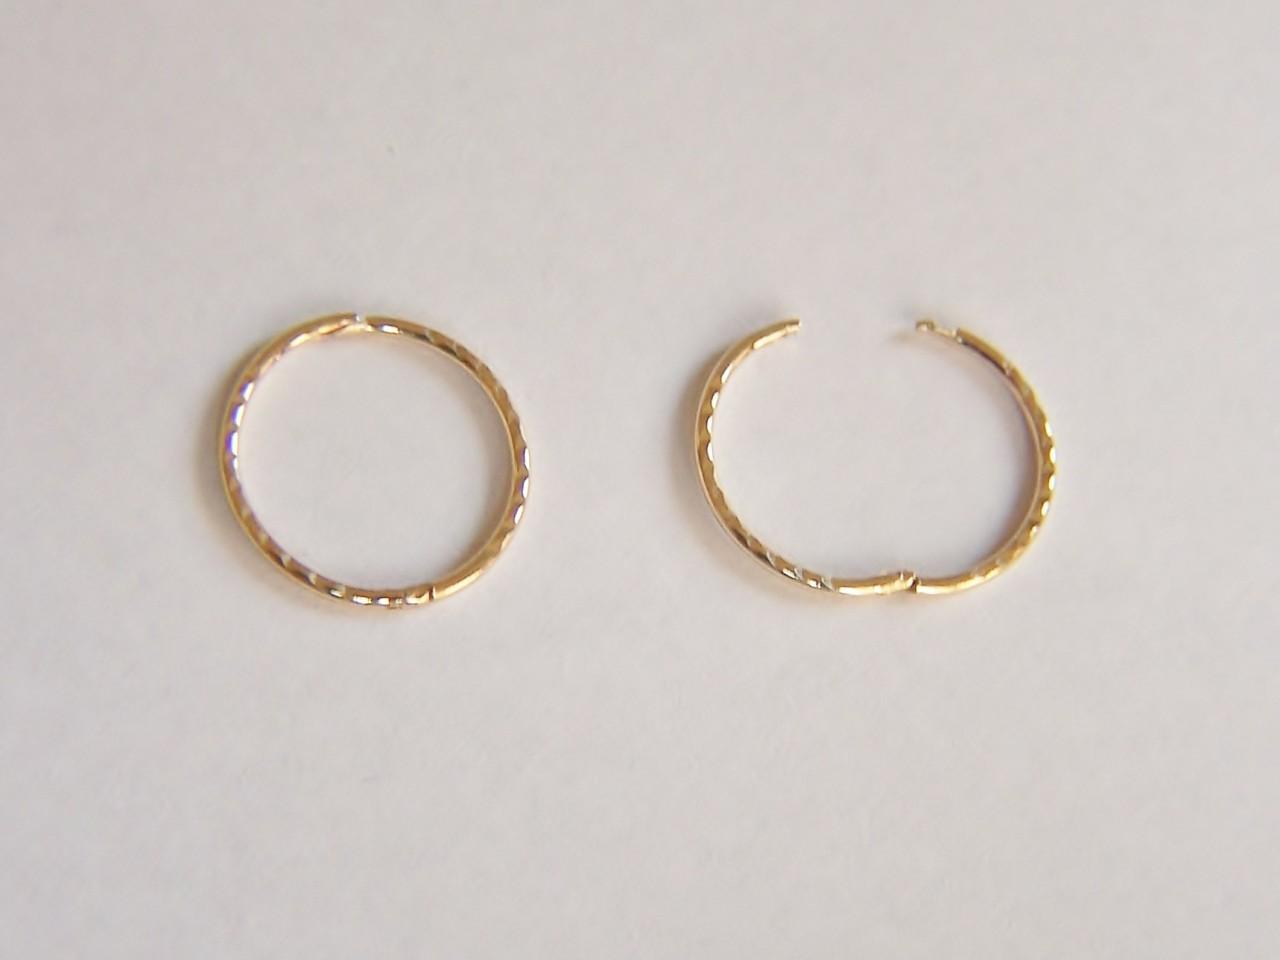 9ct Gold 13mm Small Diamond Cut Hinged Hoop Sleeper